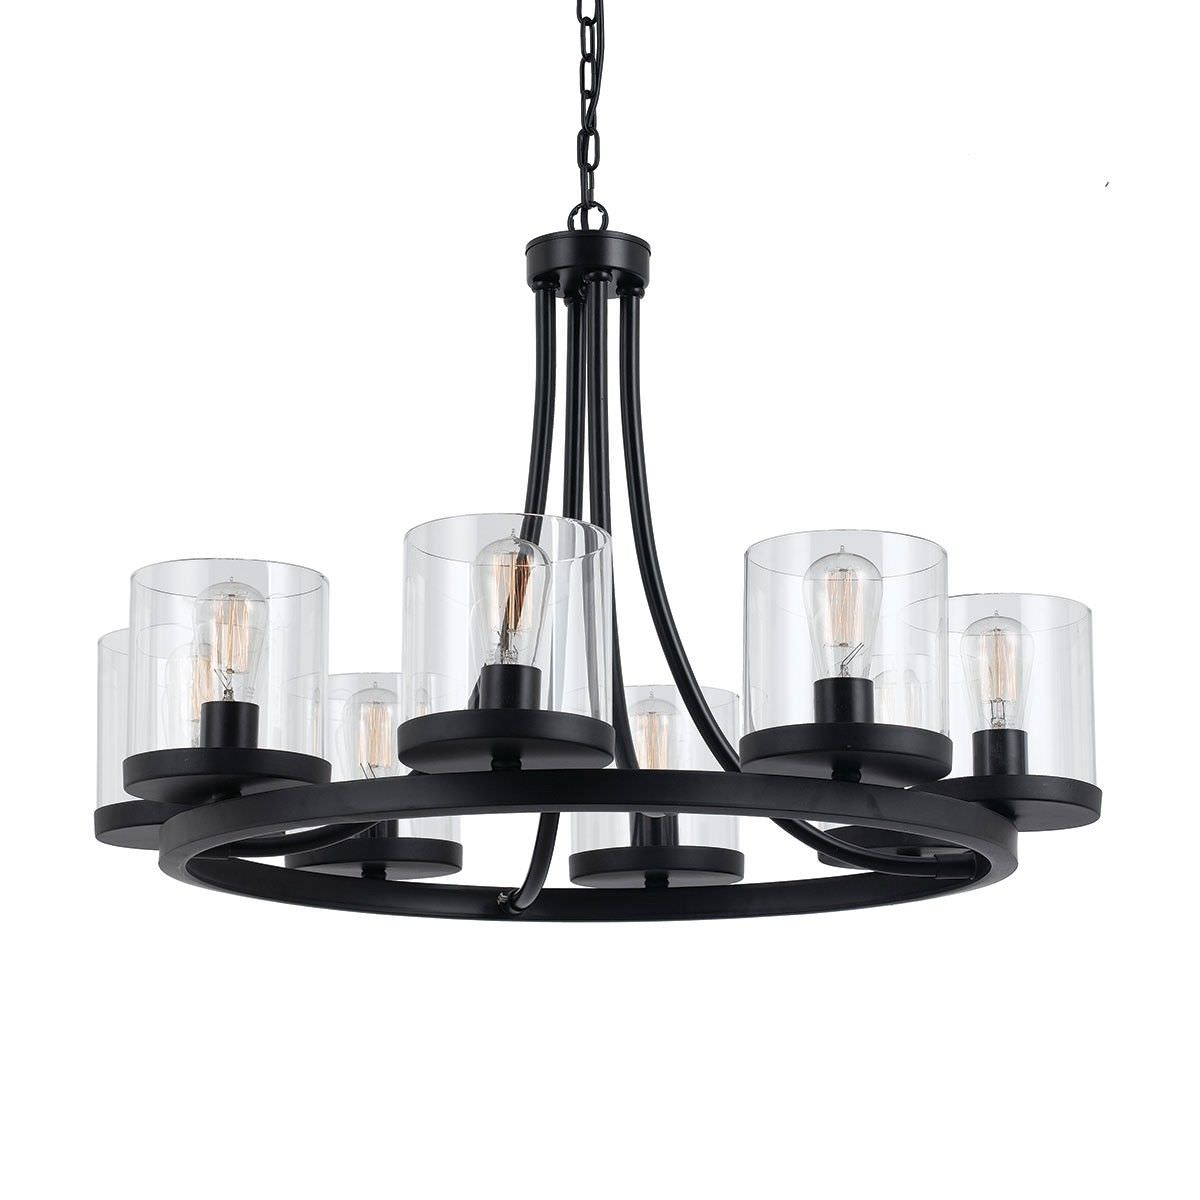 Largo Metal Pendant Light / Chandelier, Large